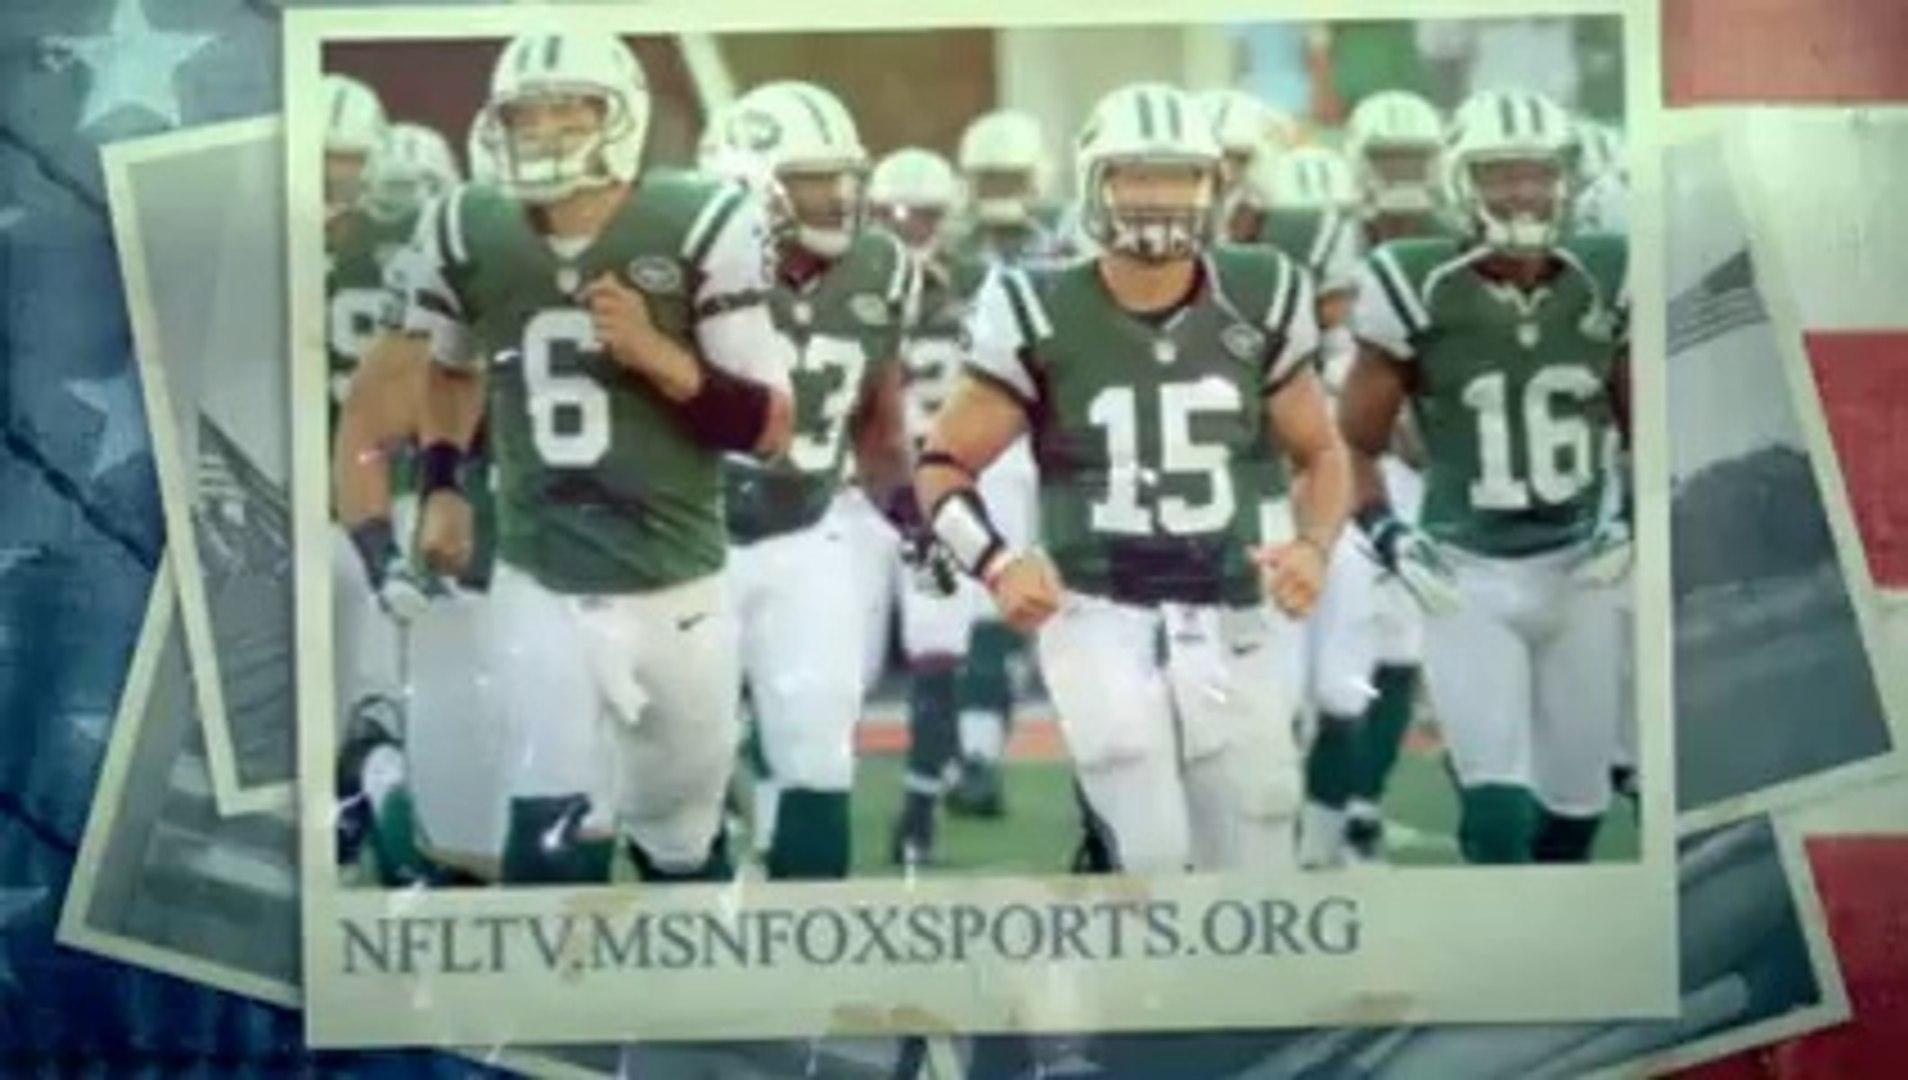 Watch Bears vs. New York Jets 2014 Live Stream - nfl games live - NFL Week 3 highlights - online nfl